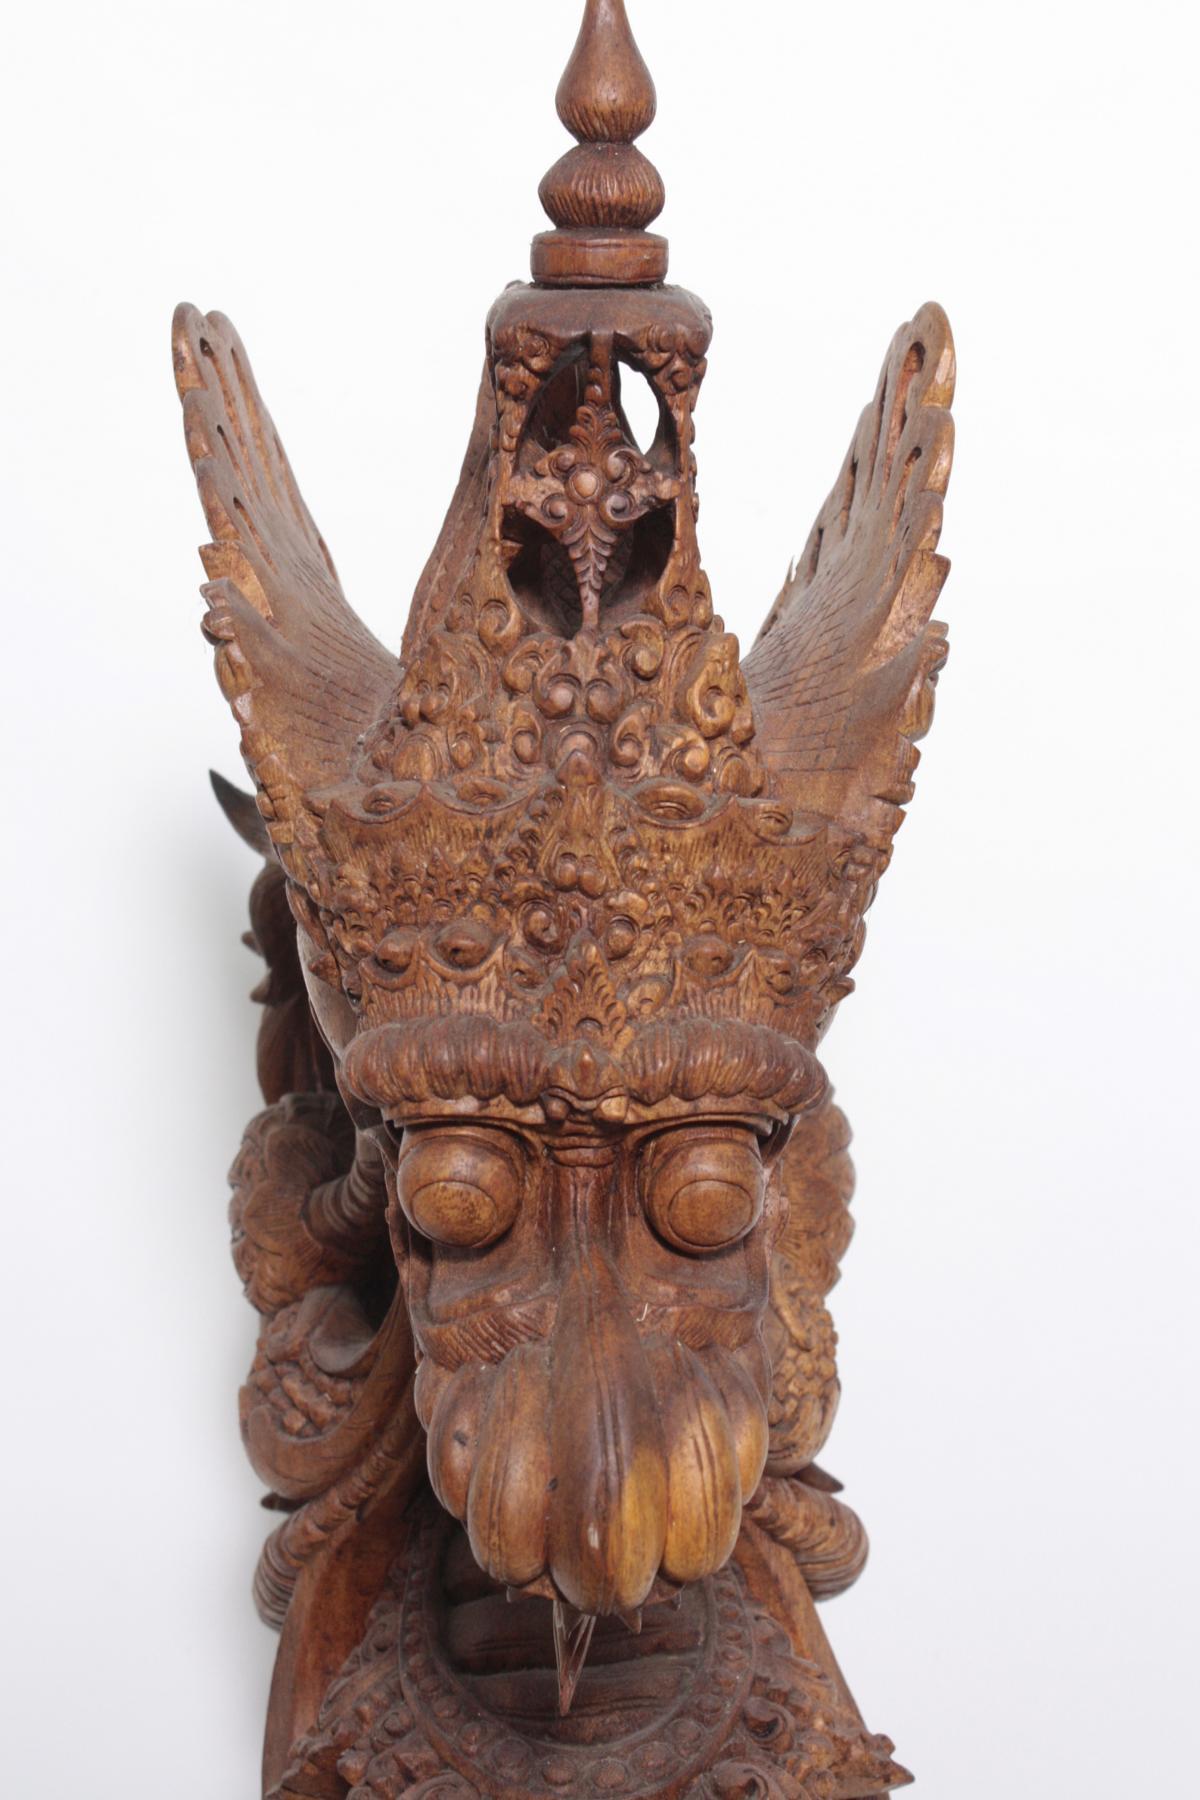 Große Holzskulptur, Drache, Indonesien, 2. Hälfte 20. Jahrhundert-3